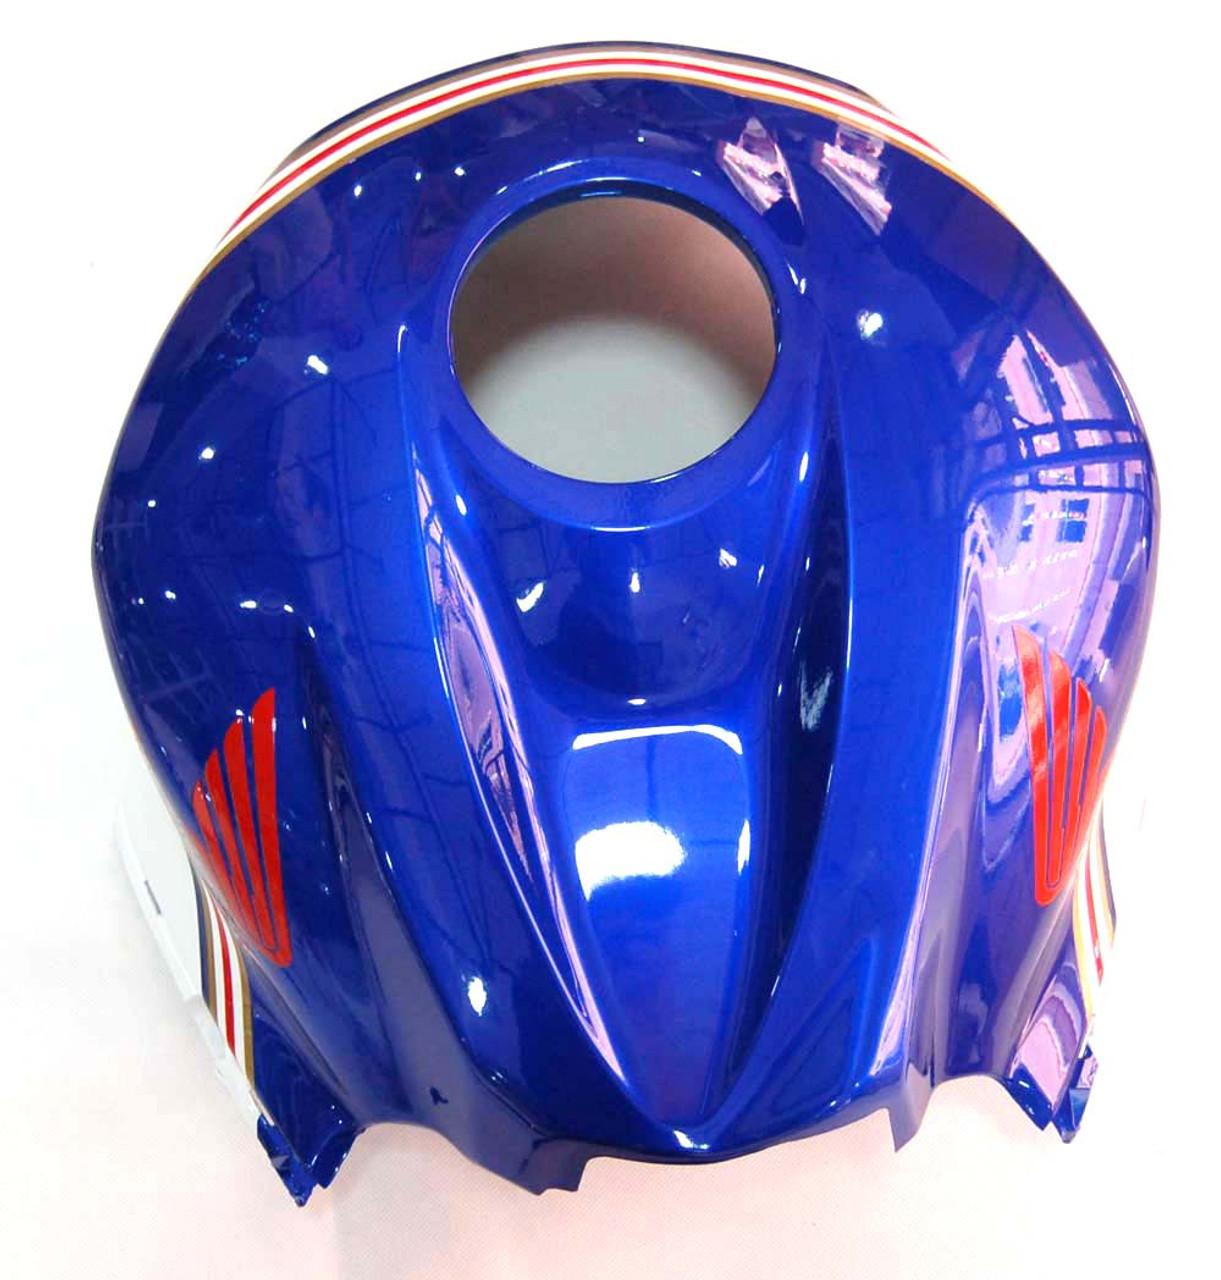 Fairings Honda CBR 600 RR Multi-Color Rothmans Racing (2009-2012)